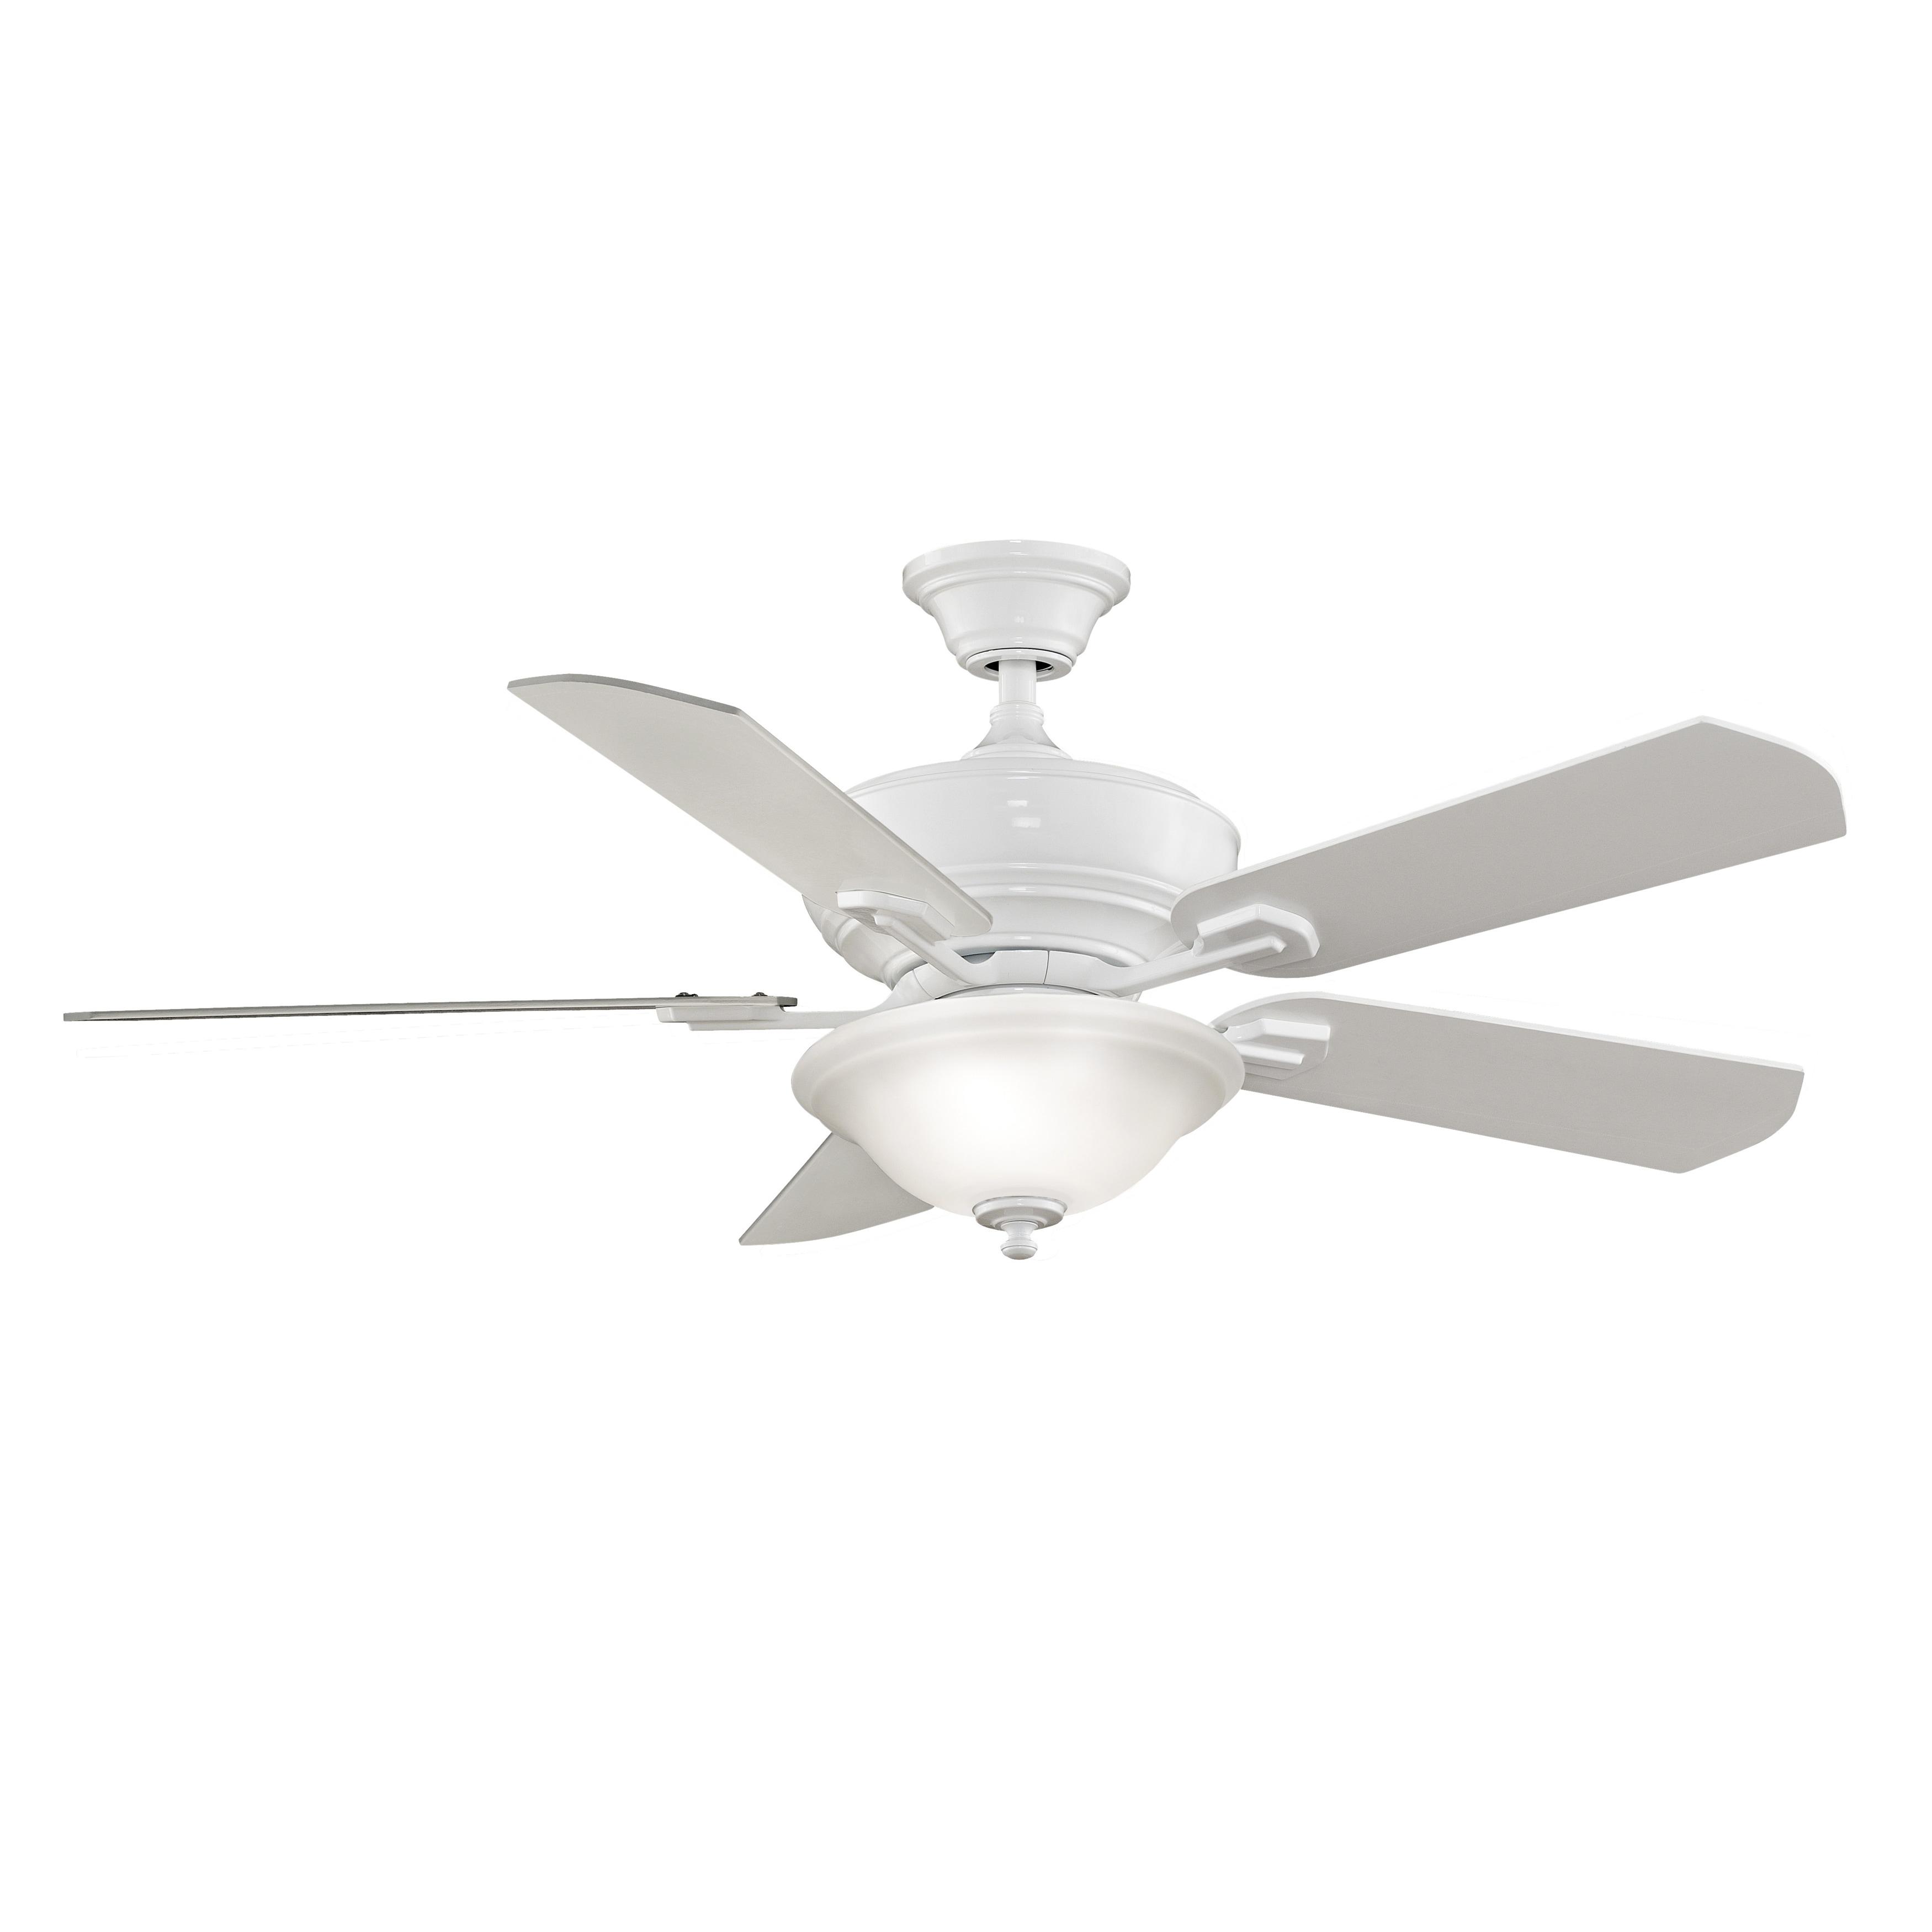 Fanimation Camhaven 52 inch 2 light Ceiling Fan Free Shipping